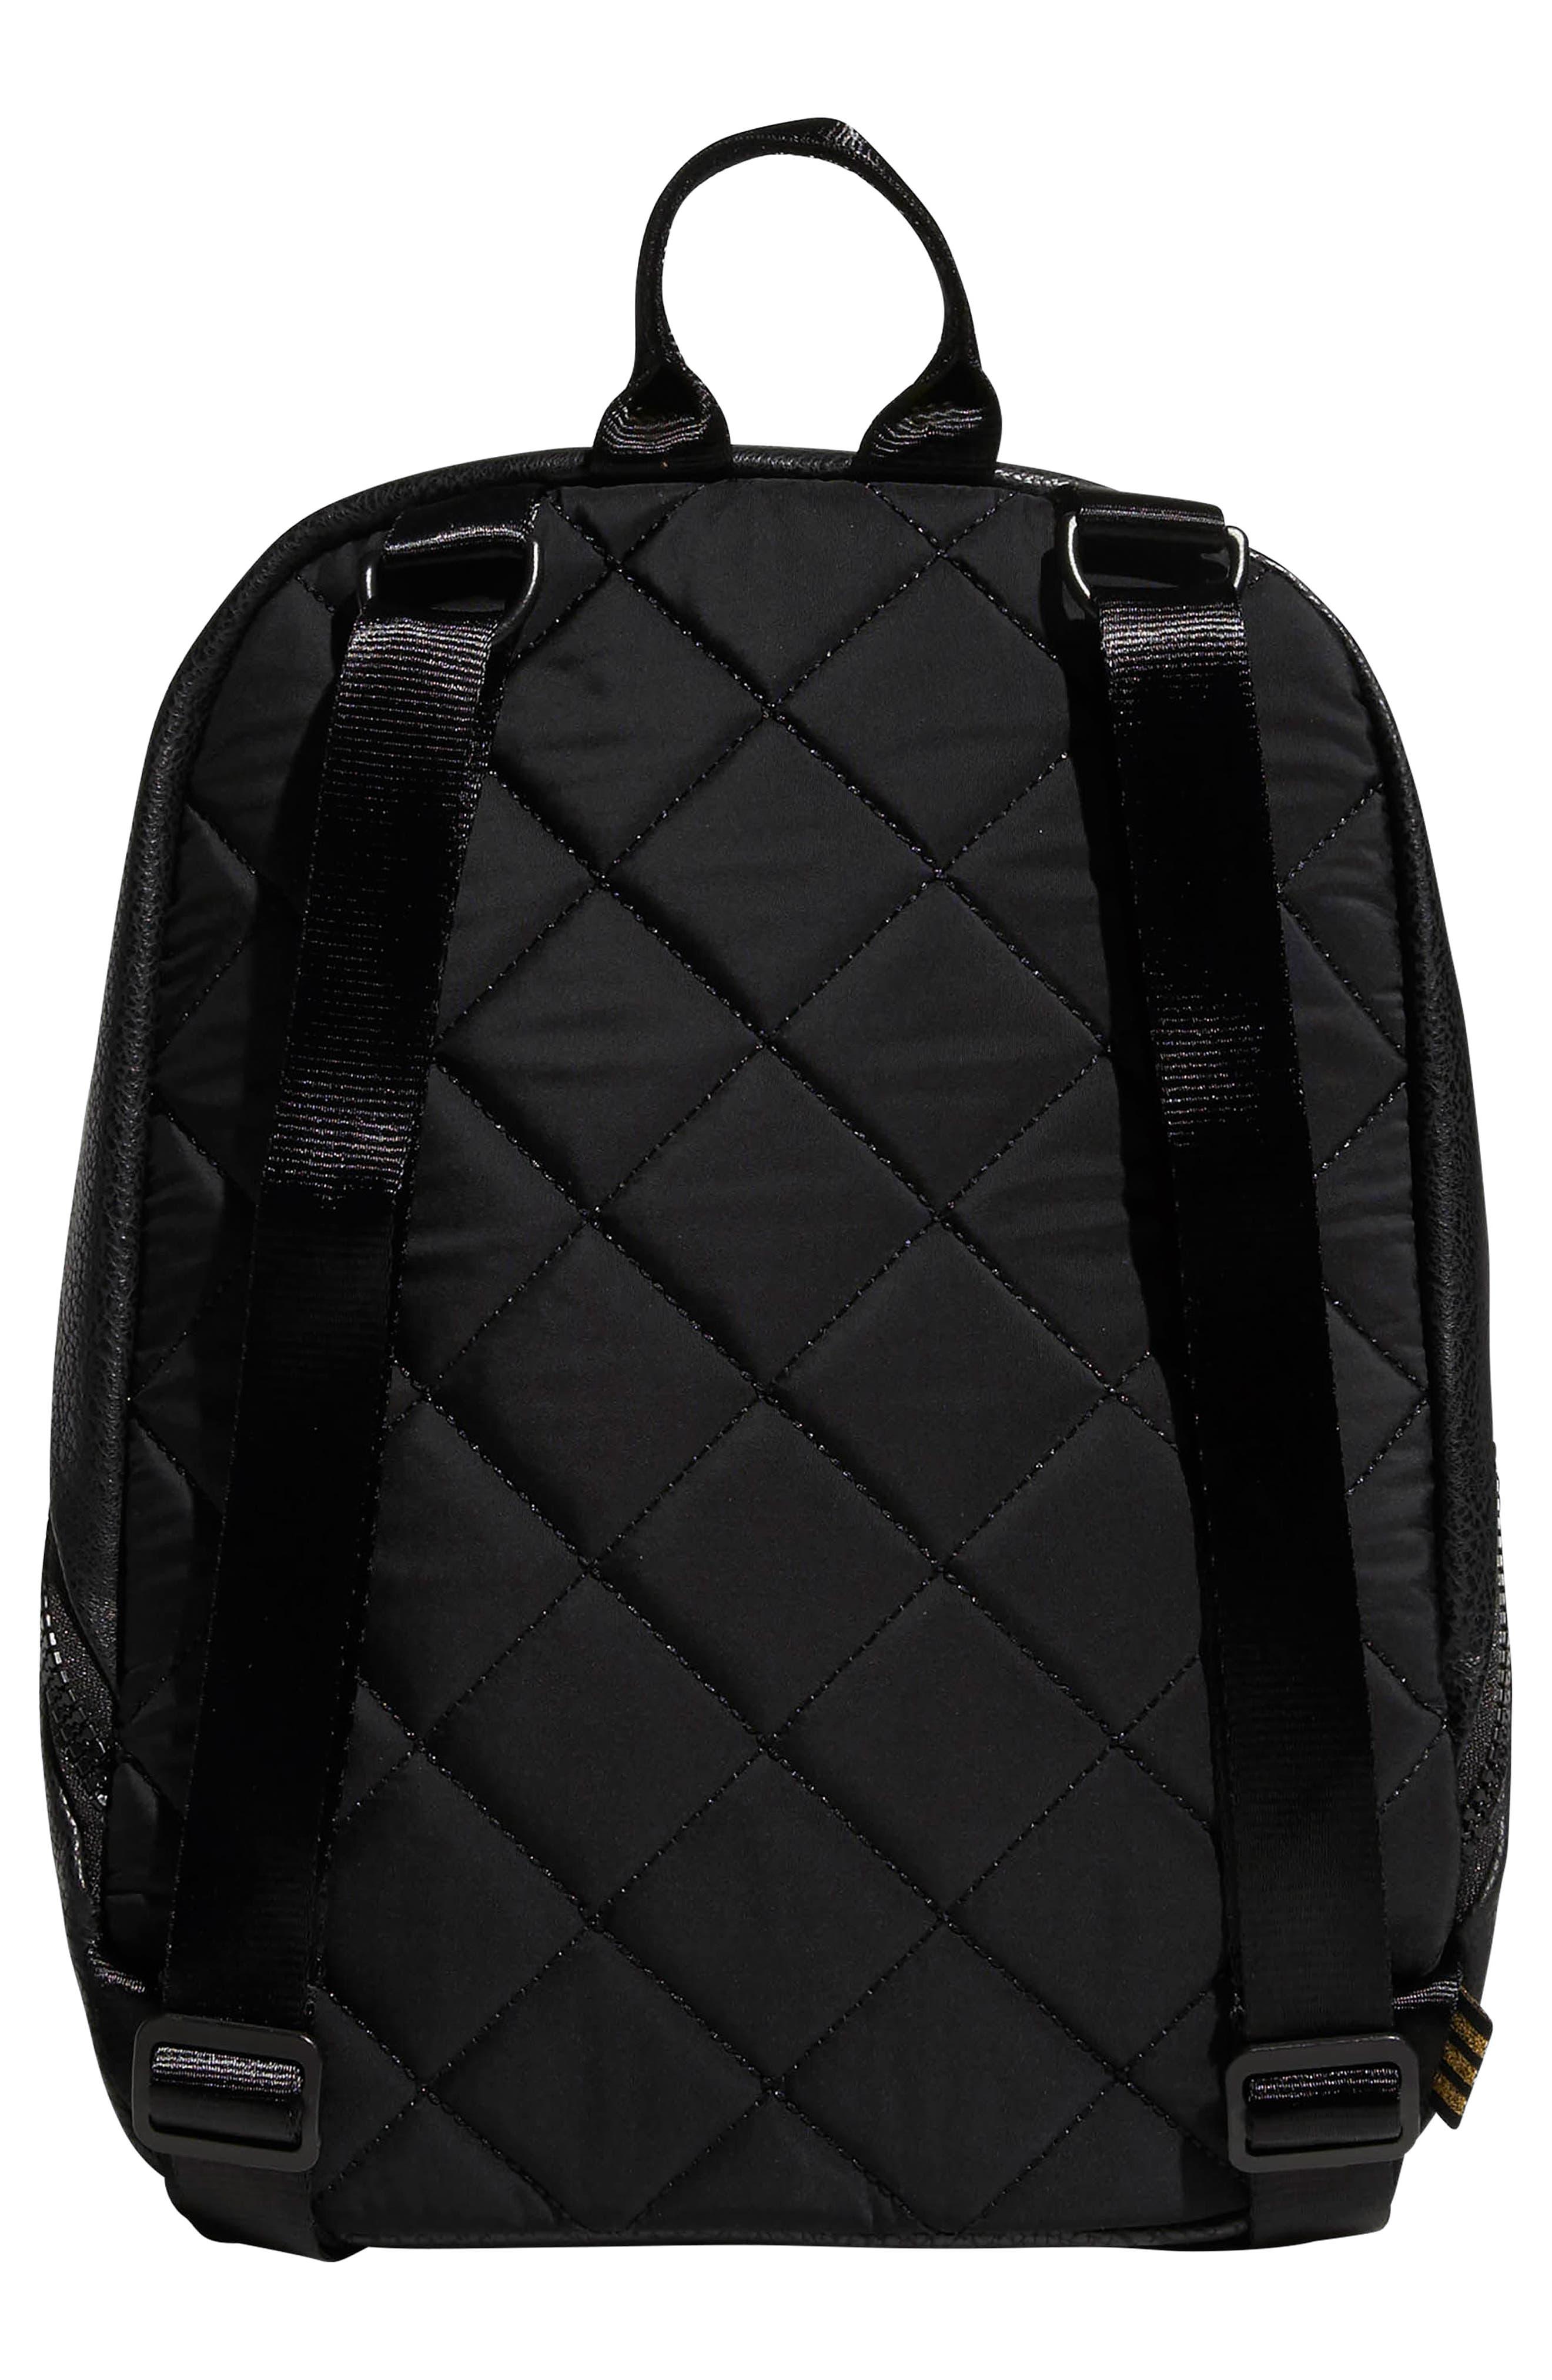 ADIDAS ORIGINALS, National Compact Backpack, Alternate thumbnail 2, color, 001